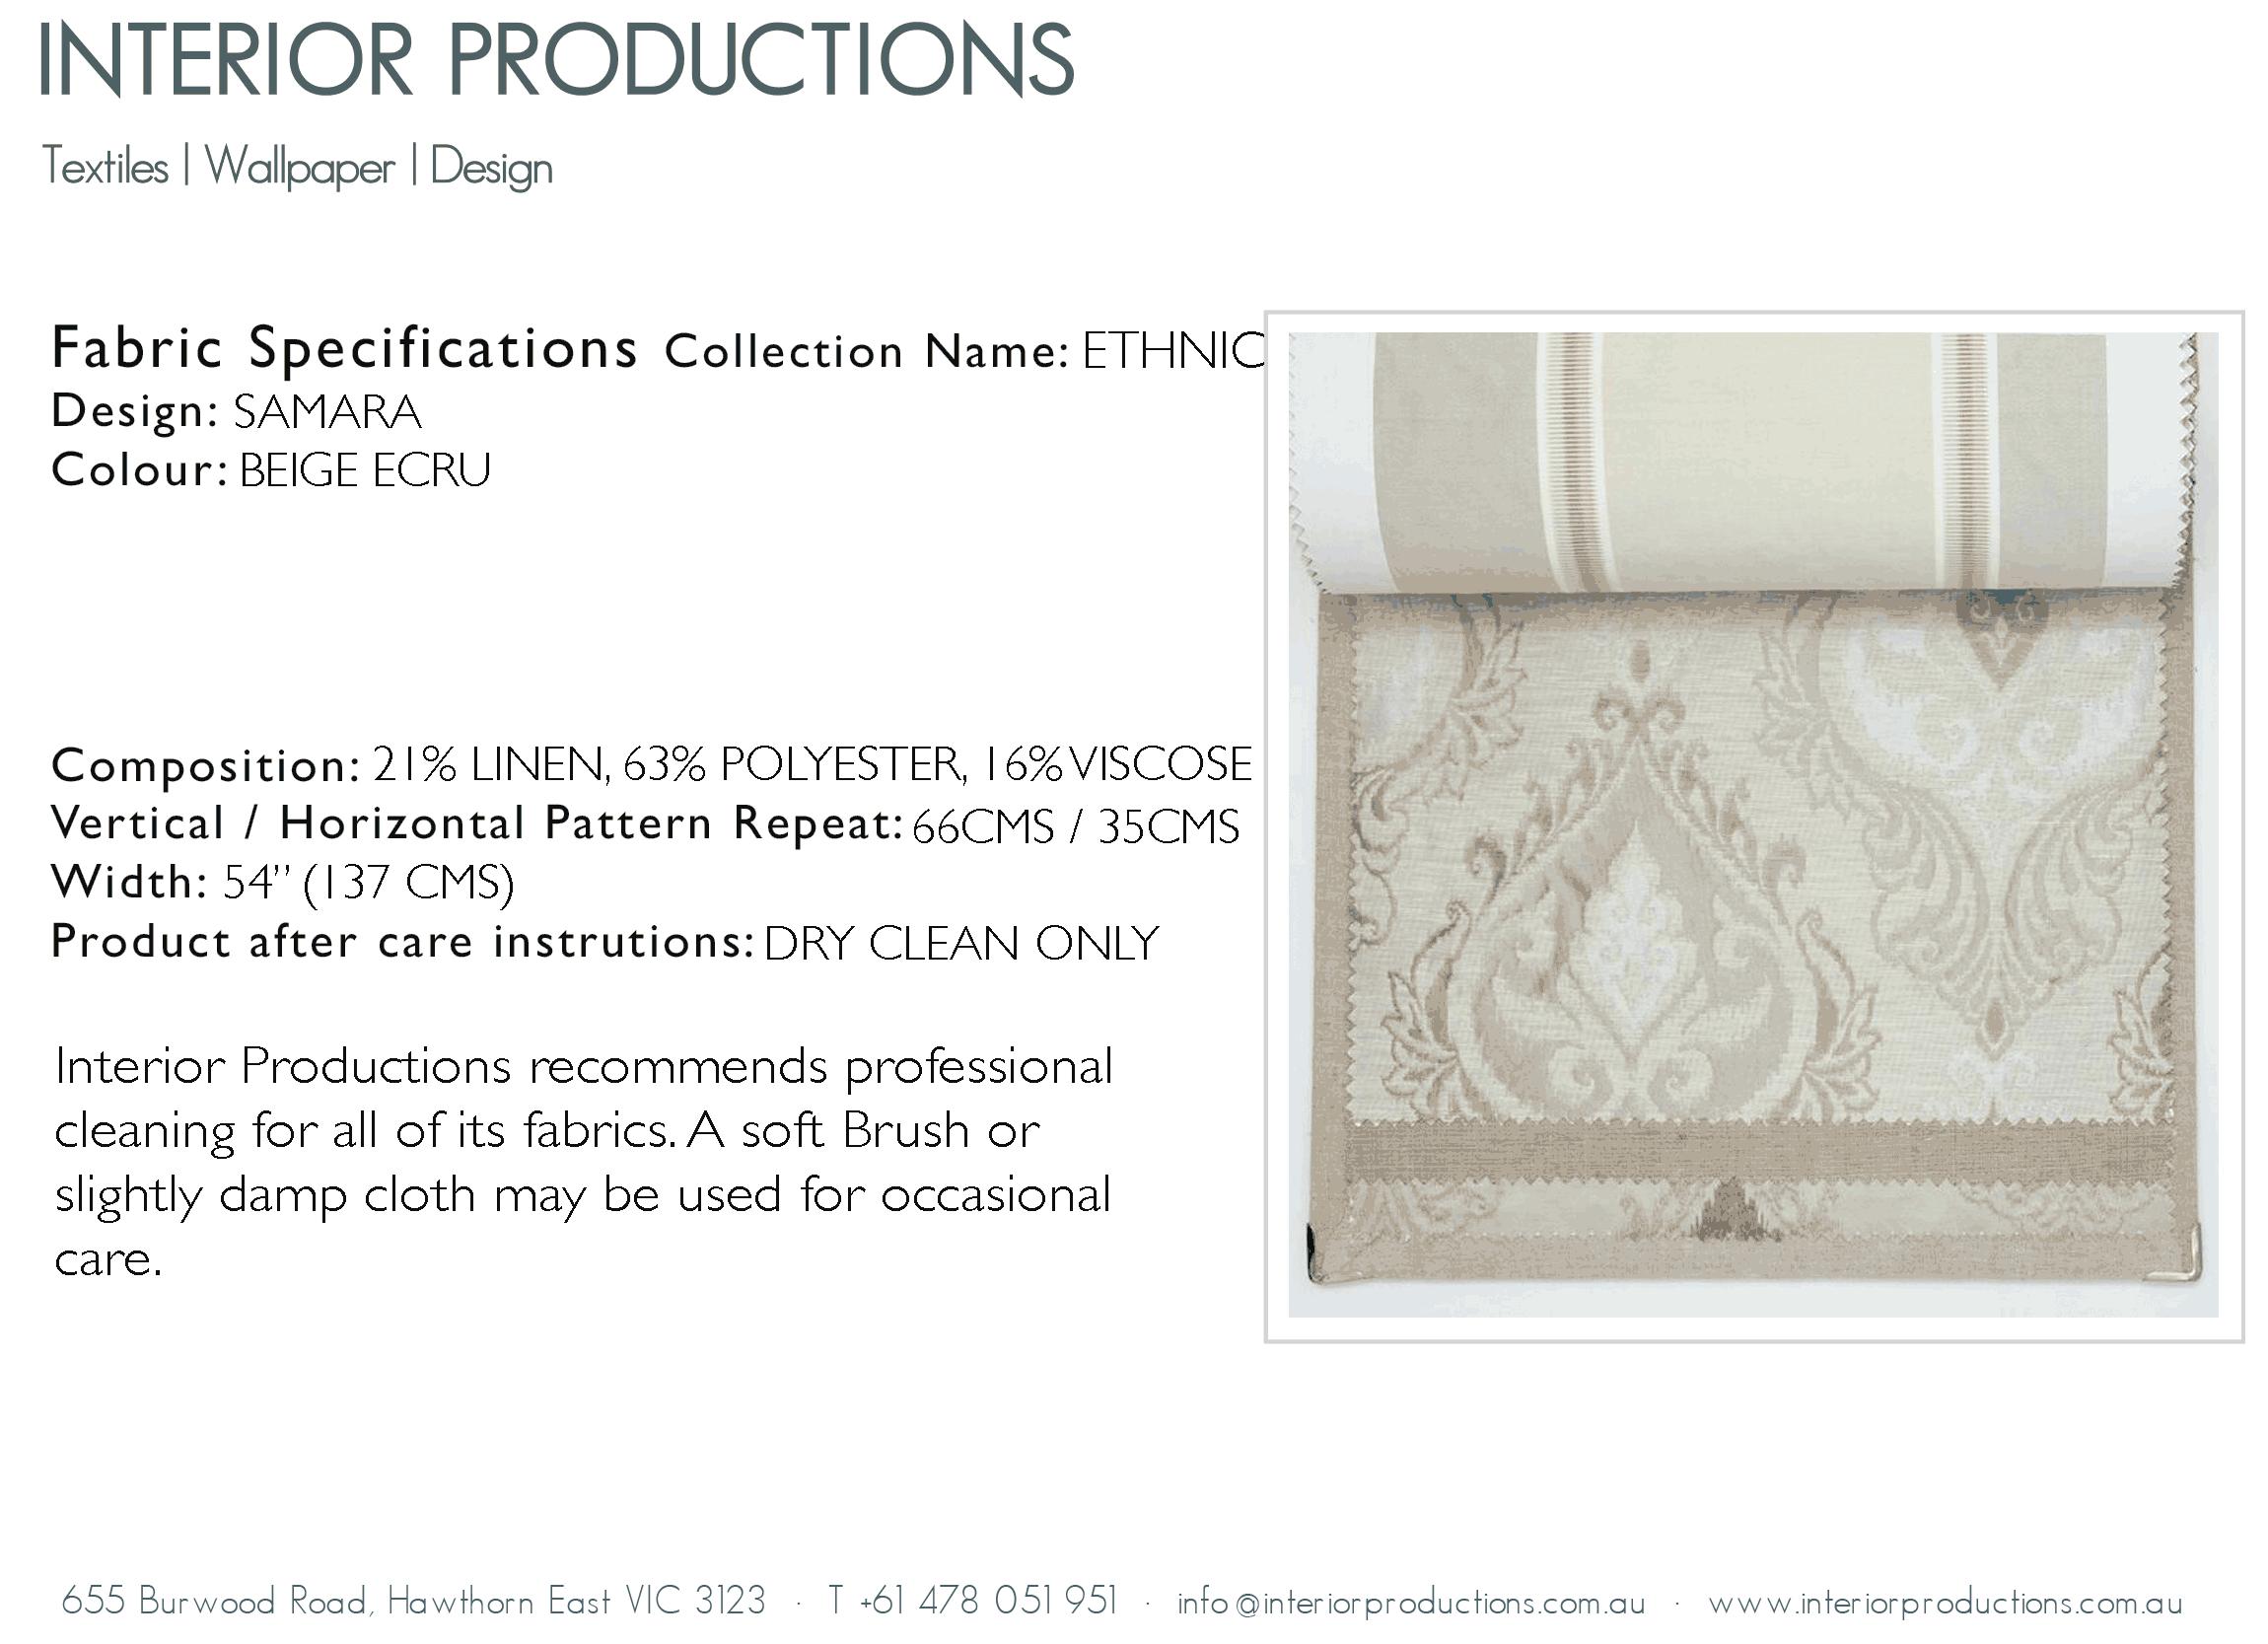 interior_productions_SAMARA---BEIGE-ECRU